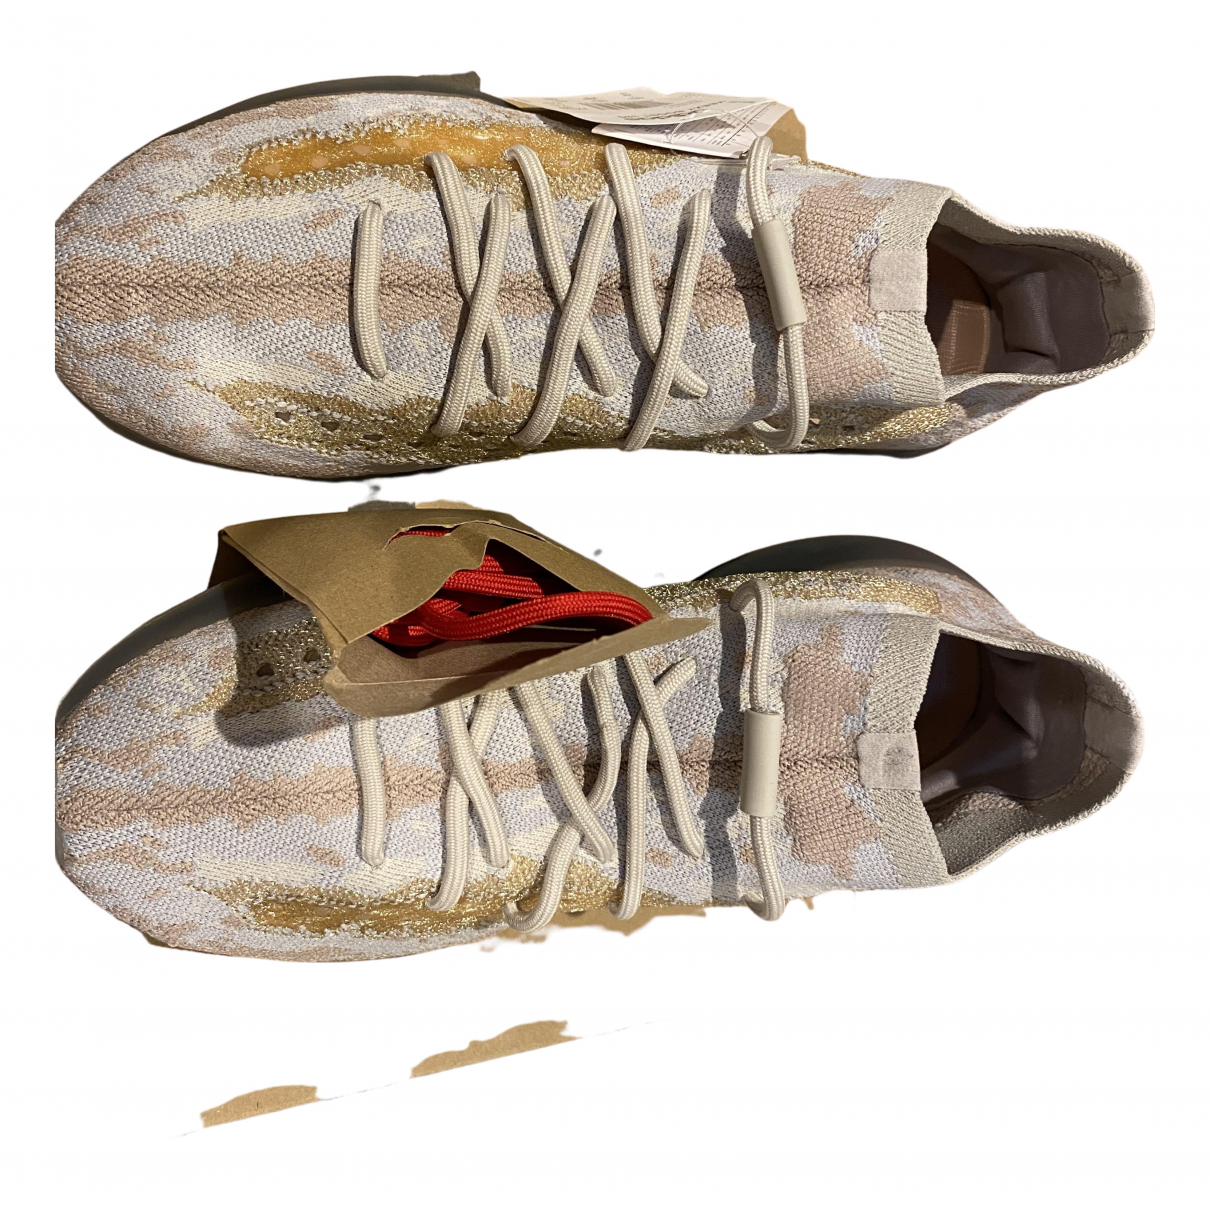 Yeezy X Adidas - Baskets Boost 380 pour homme en toile - beige